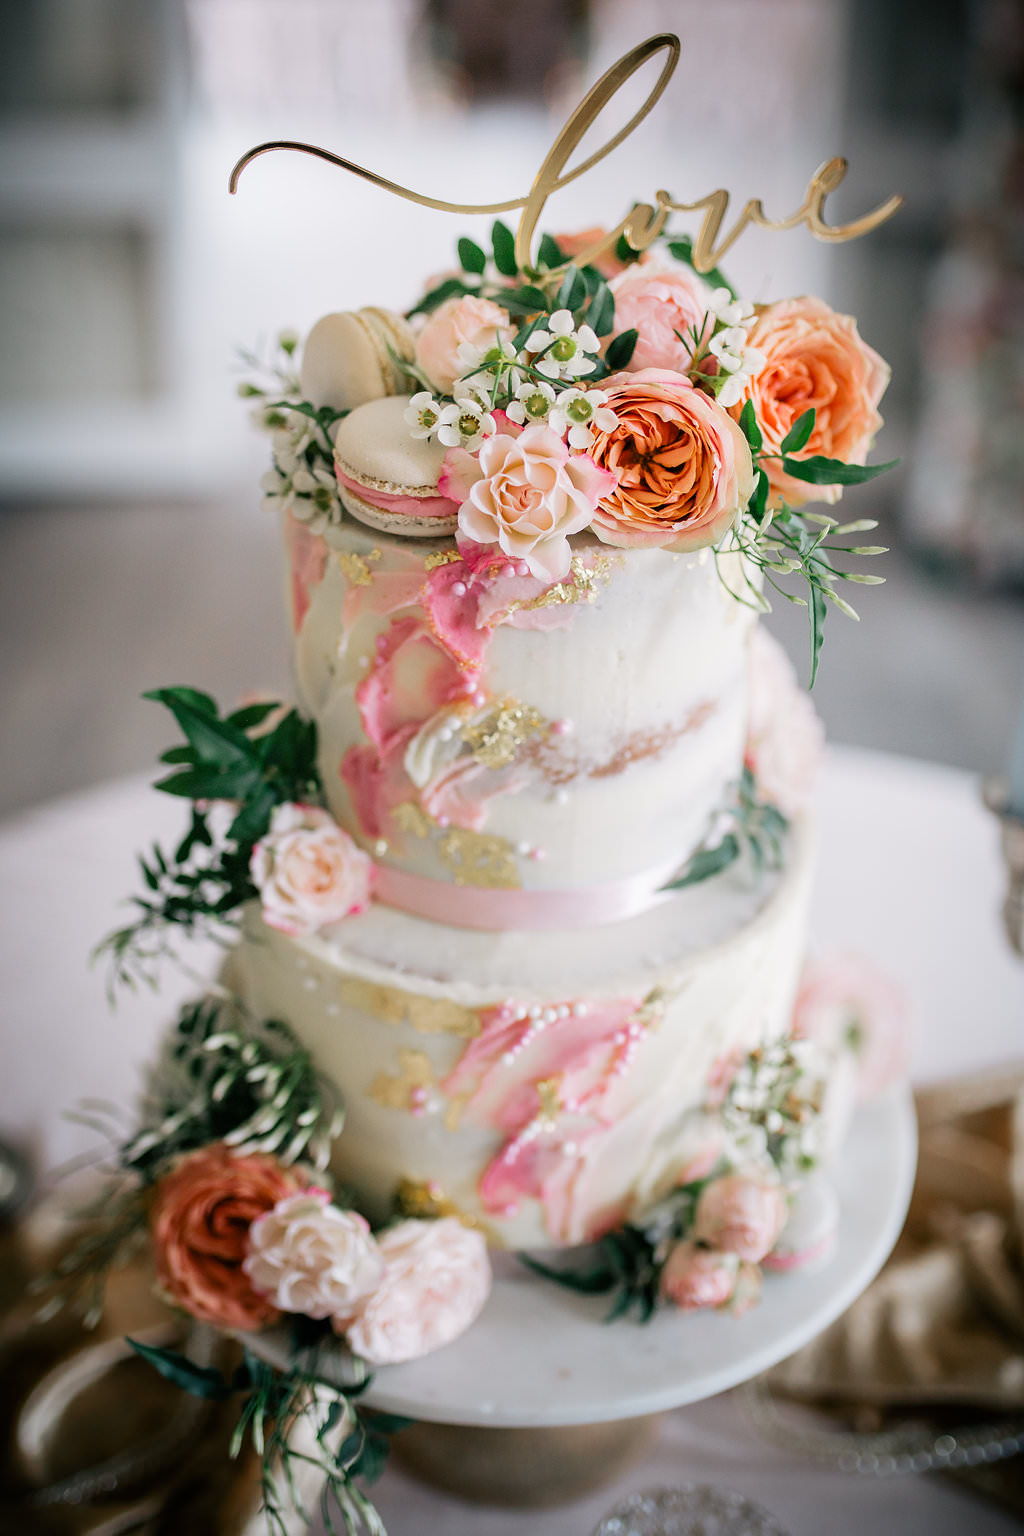 Cake Pink Artist Palette Painted Brush Work Gold Leaf Flowers Macarons Lapstone Barn Wedding Ideas Cotswolds Katie Hamilton Photography